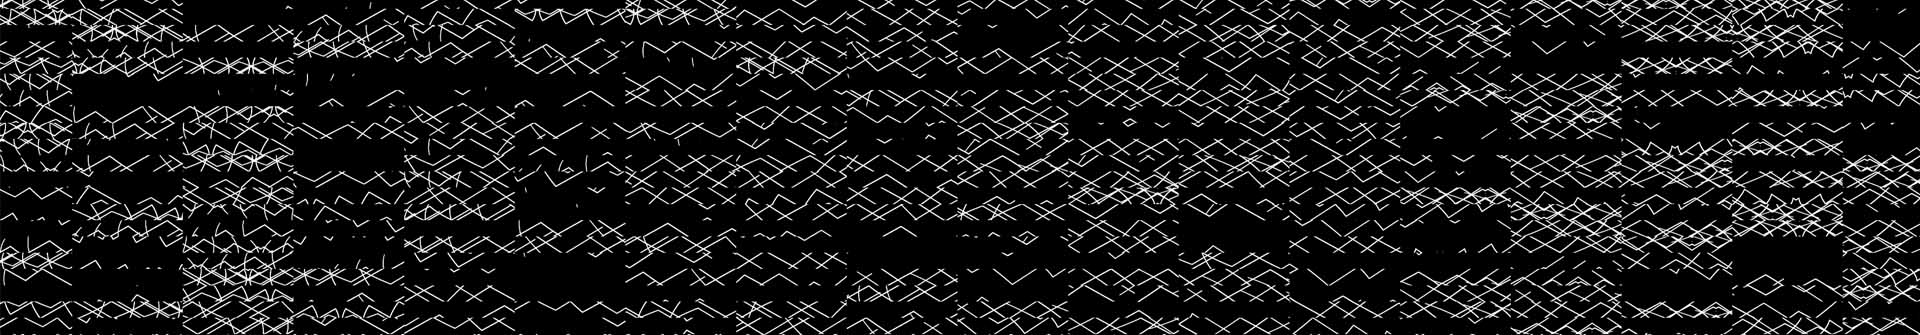 ultrawide VJ loop motion background